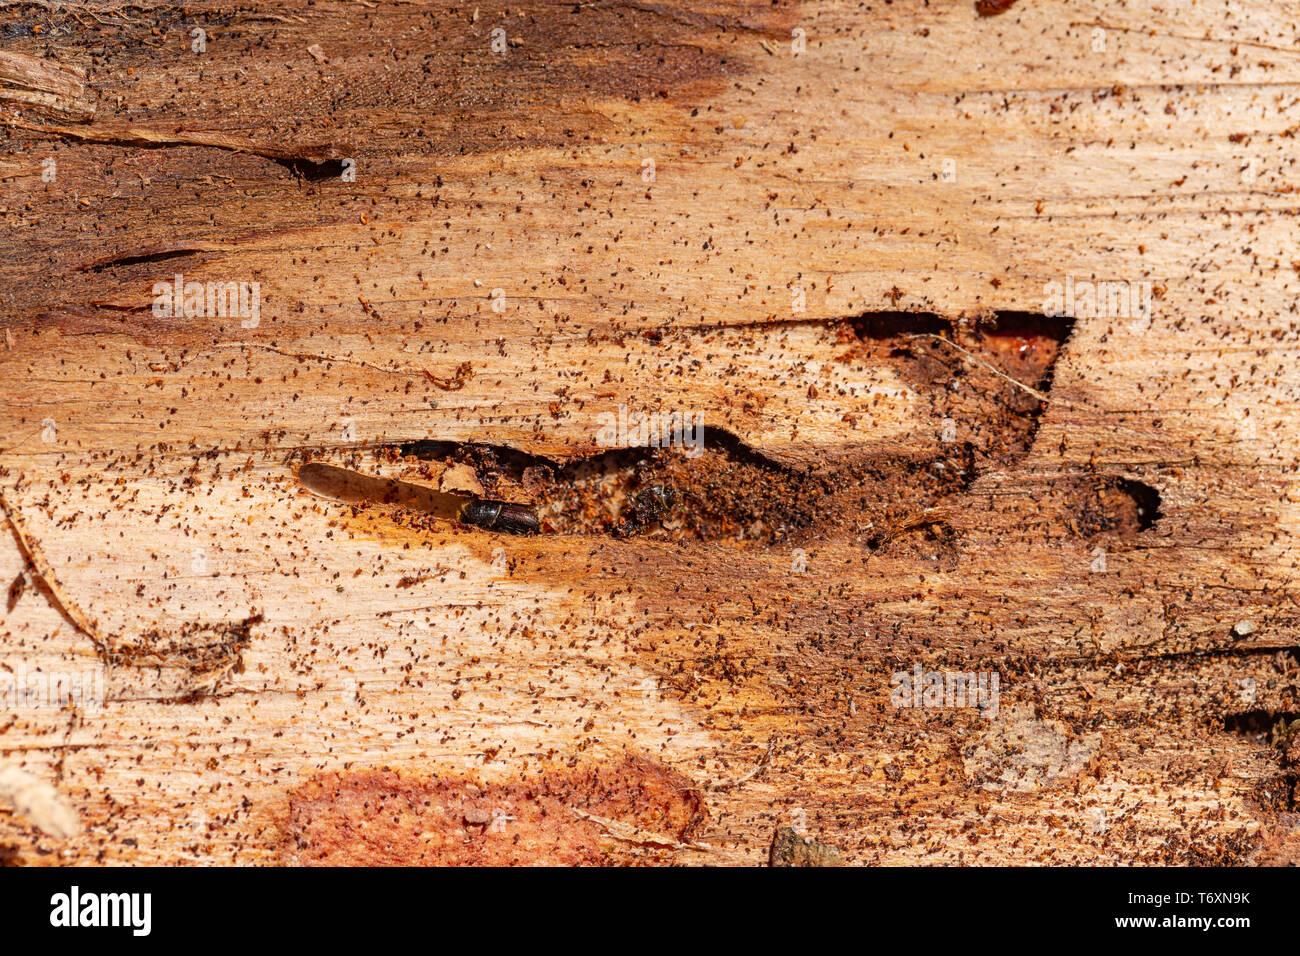 Closeup of damaged bark and wood caused by bark beetle - Scolytinae Stock Photo